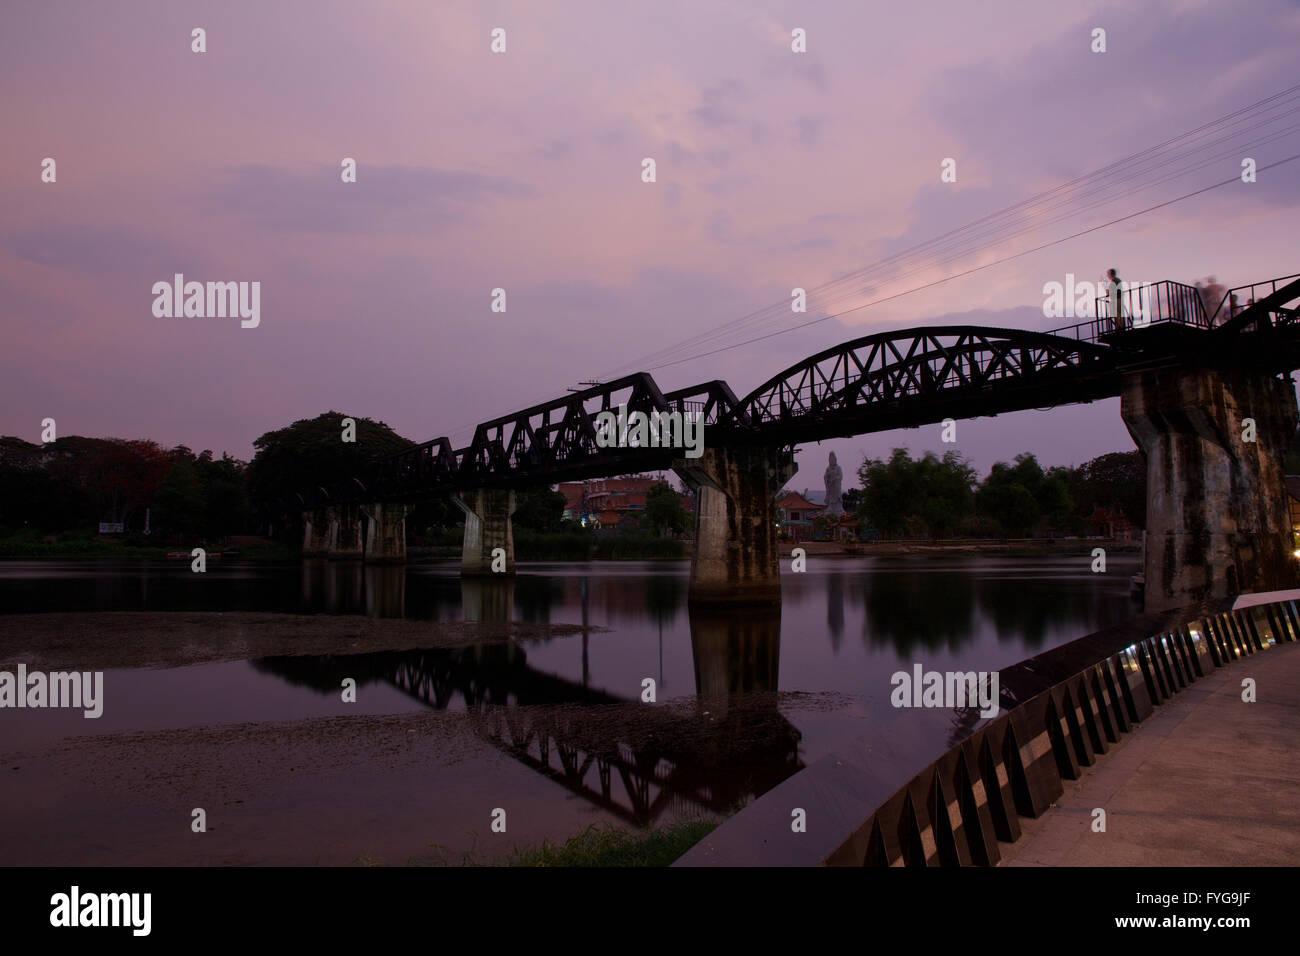 Bridge over The River Kwai after sunset - Kanchanaburi, Thailand - Stock Image